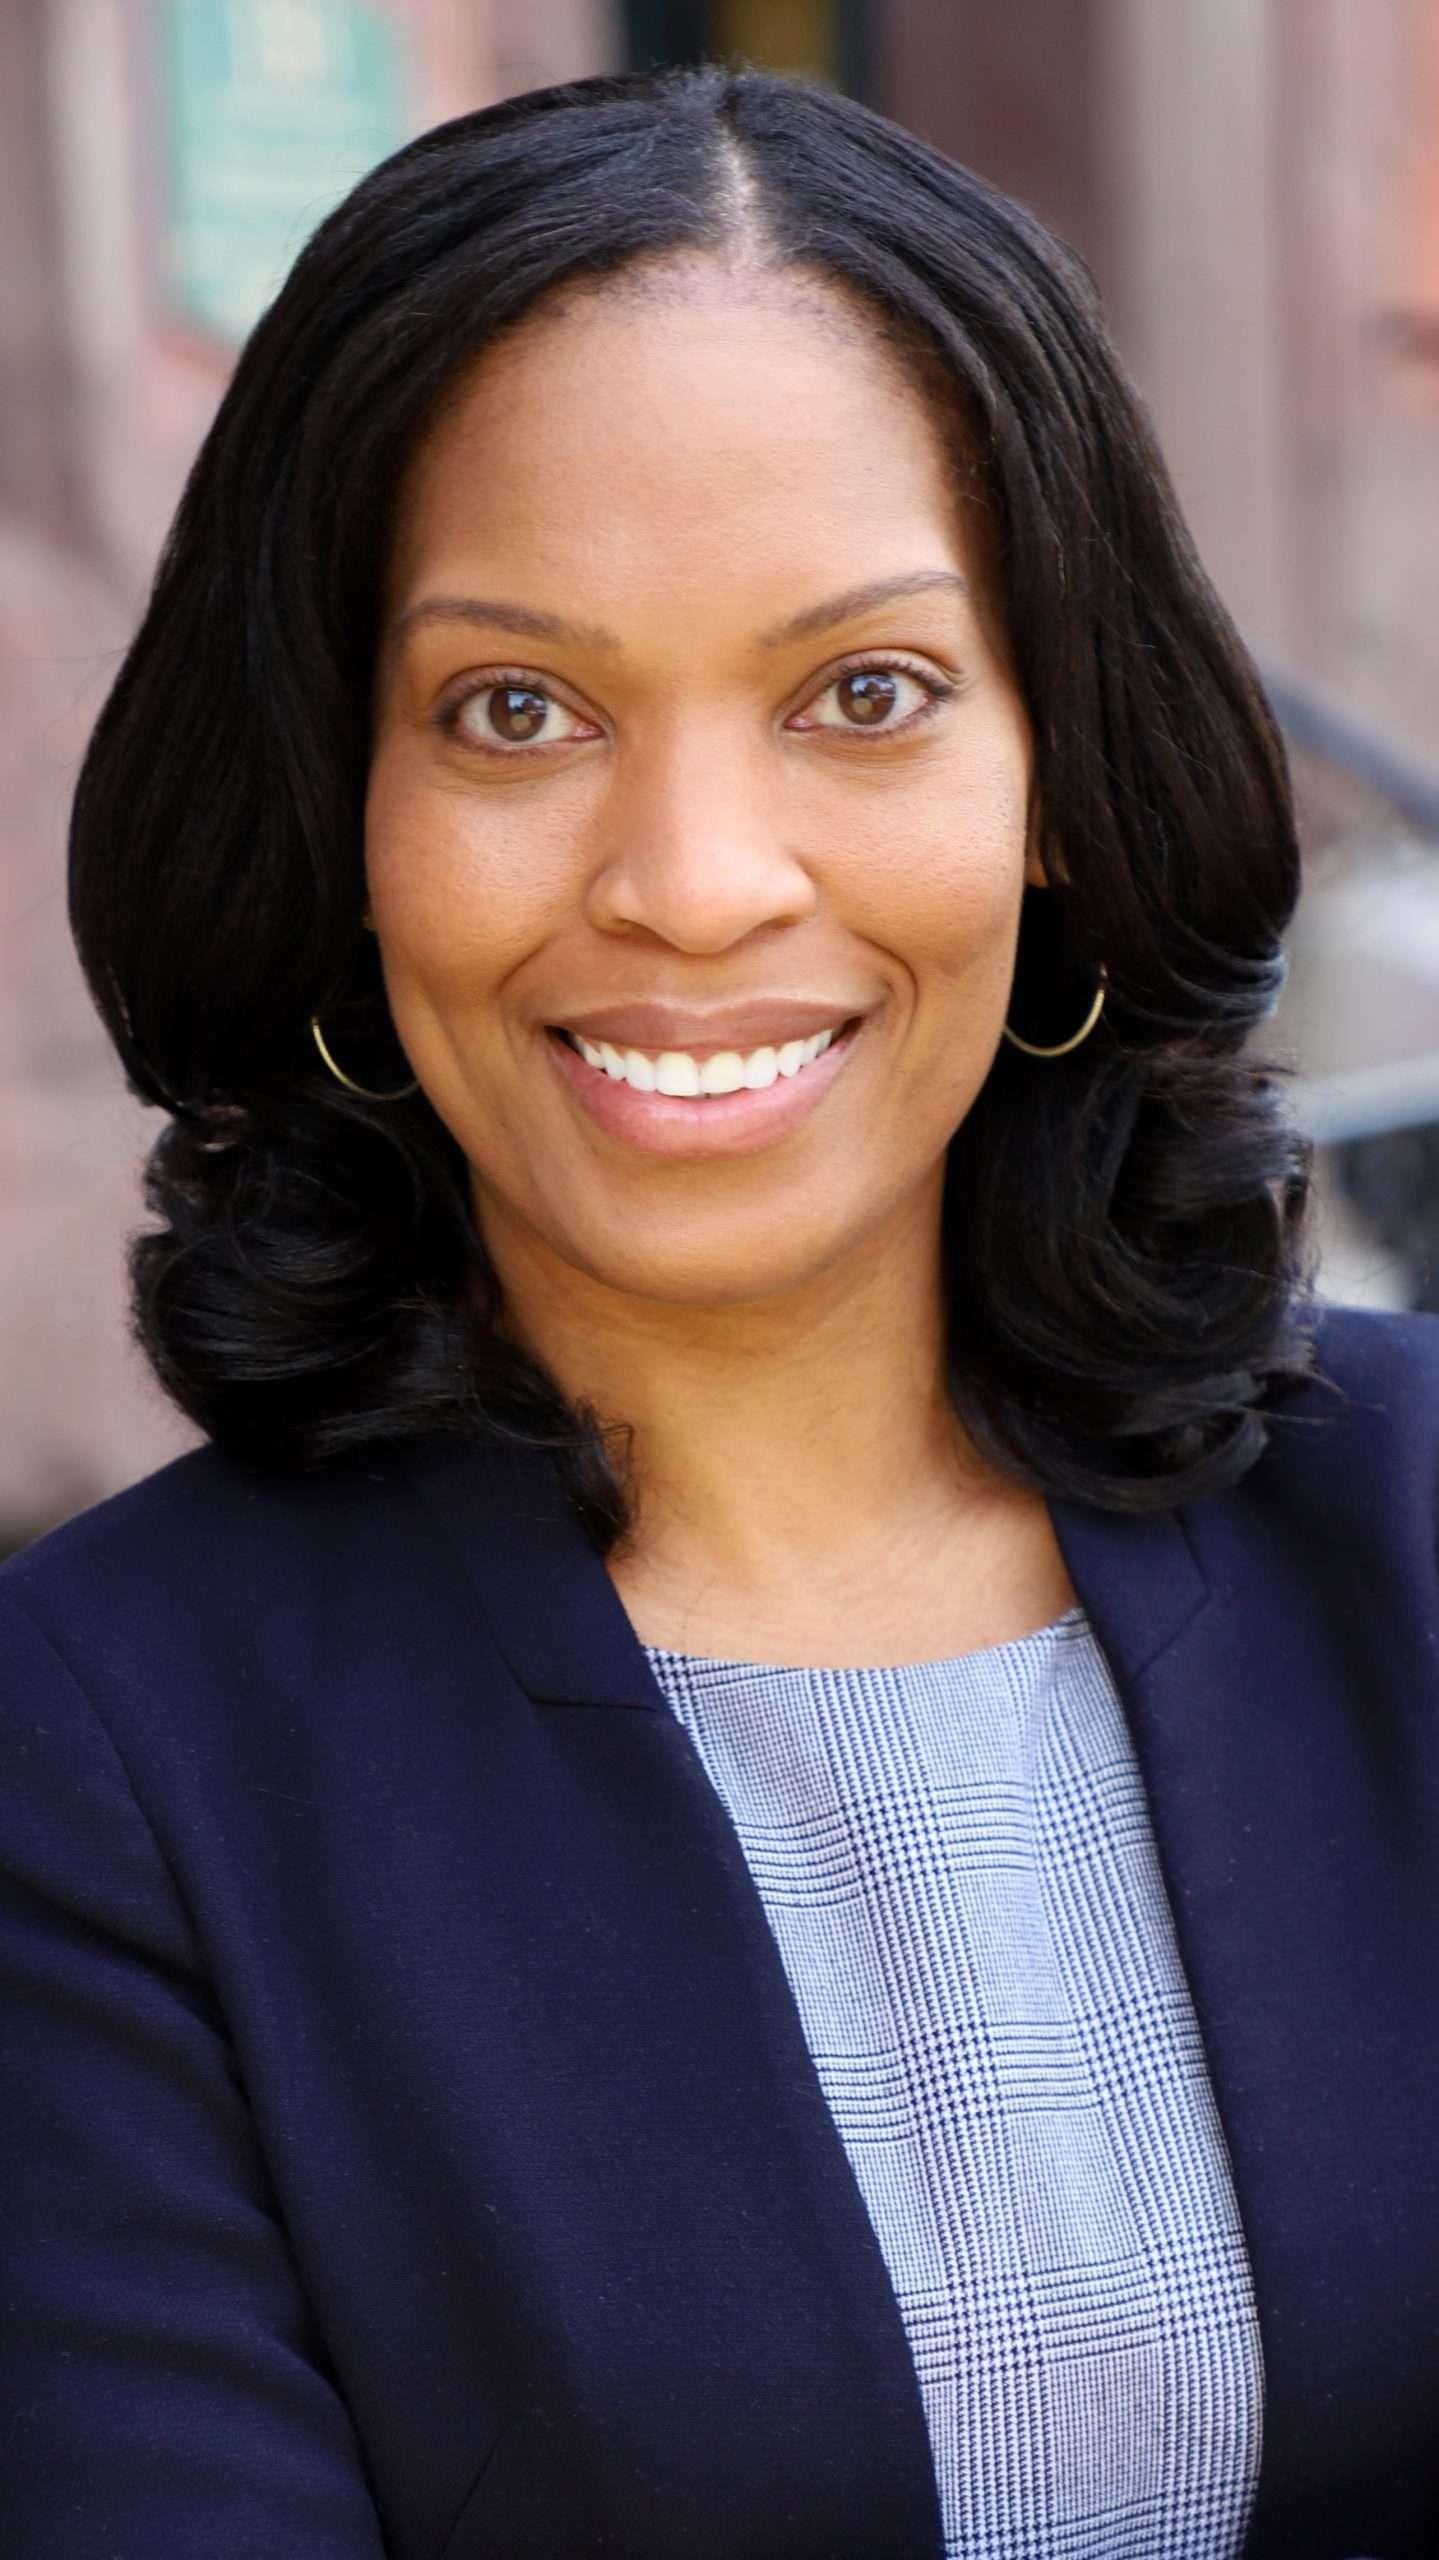 Headshot of Tamara Nicholson, owner of Unicorn Consulting Solutions